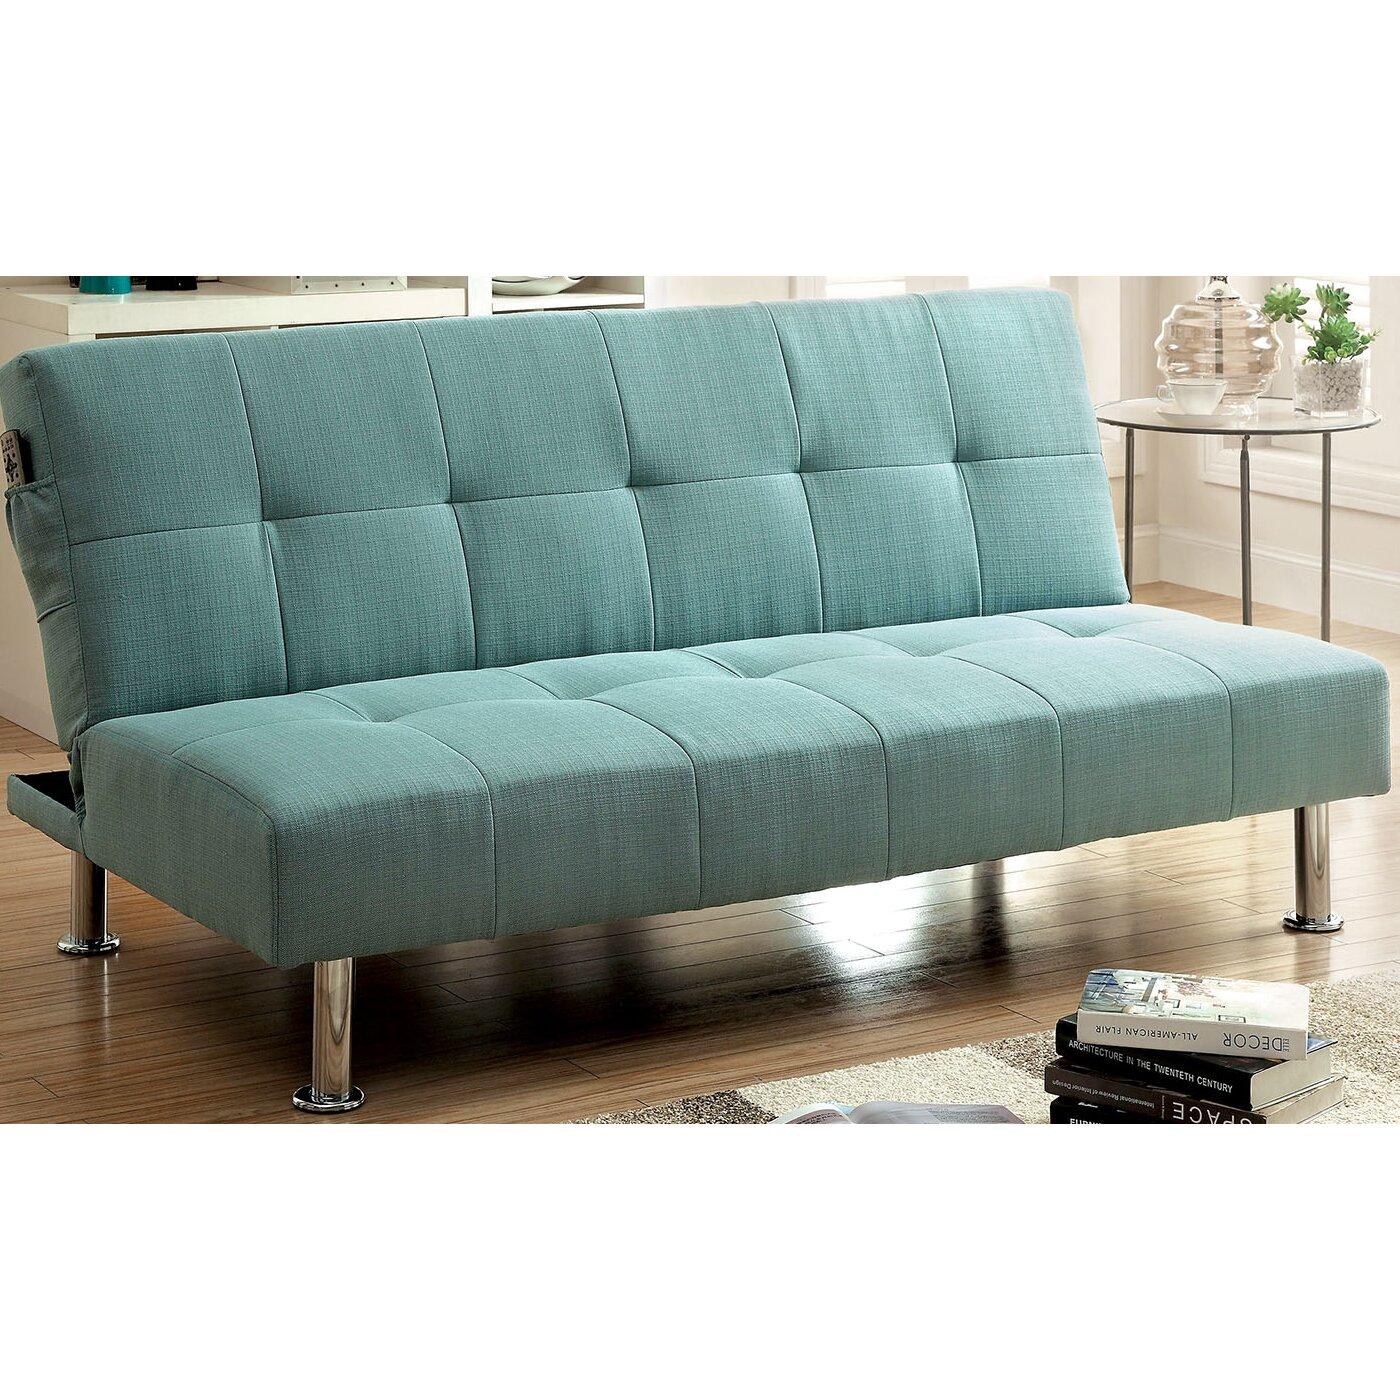 Futon Sofa Sleeper: A&J Homes Studio Tufted Futon Sleeper Sofa & Reviews